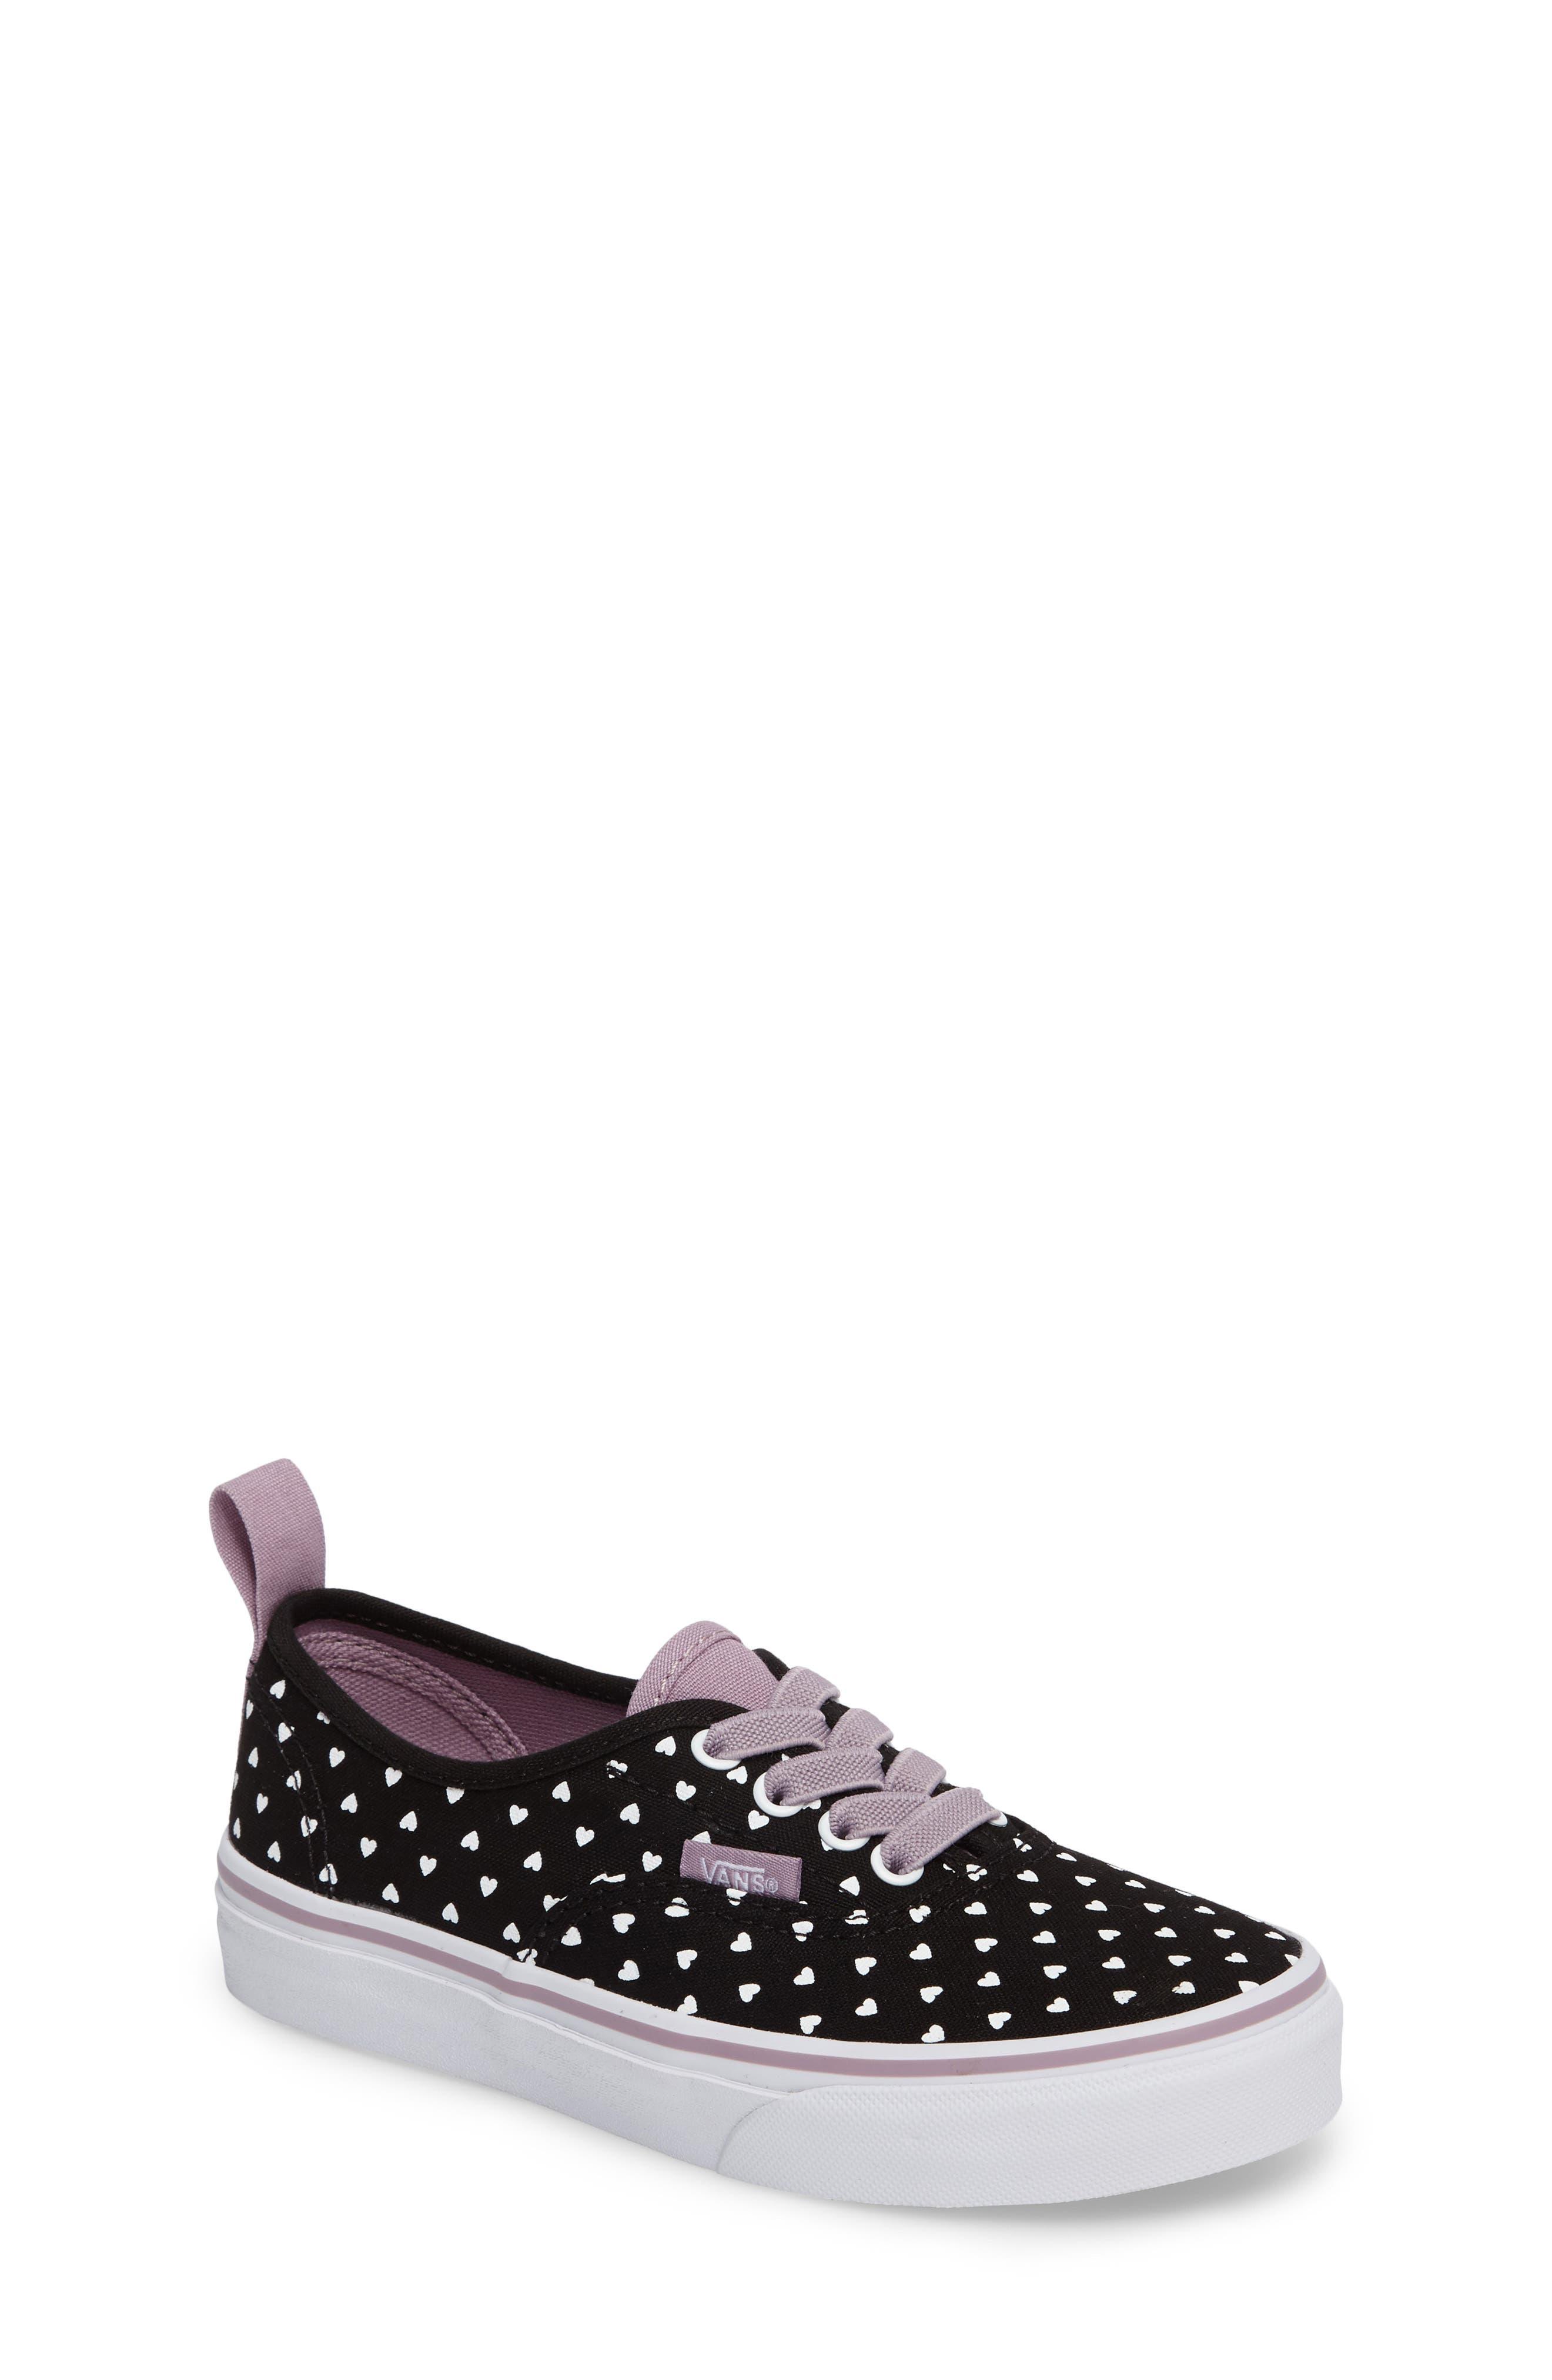 Vans Authentic Elastic Lace Sneaker (Baby, Walker, Toddler, Little Kid & Big Kid)